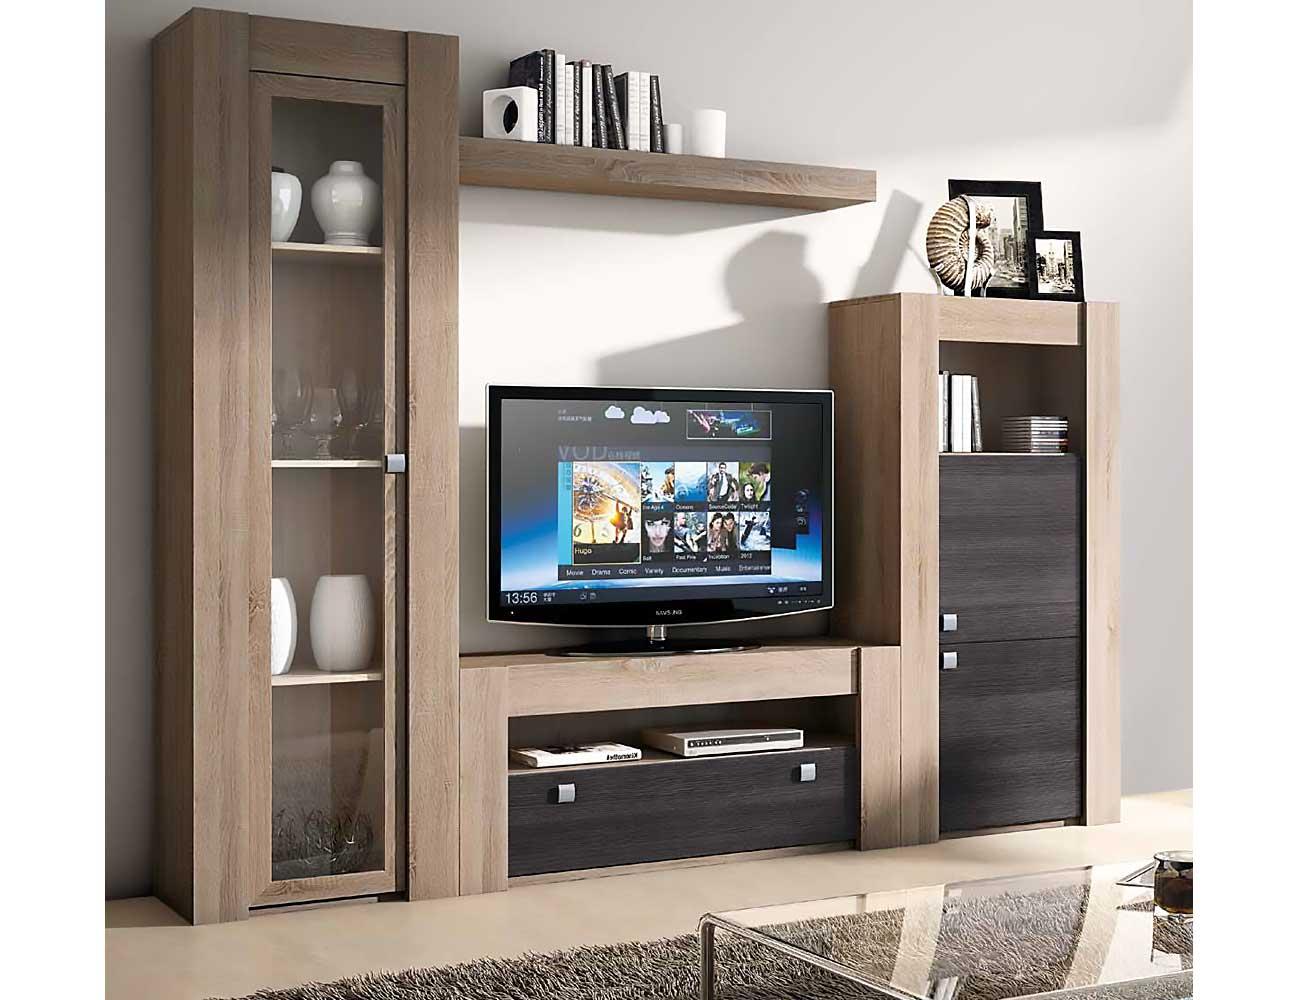 Mueble salon moderno comp06a1